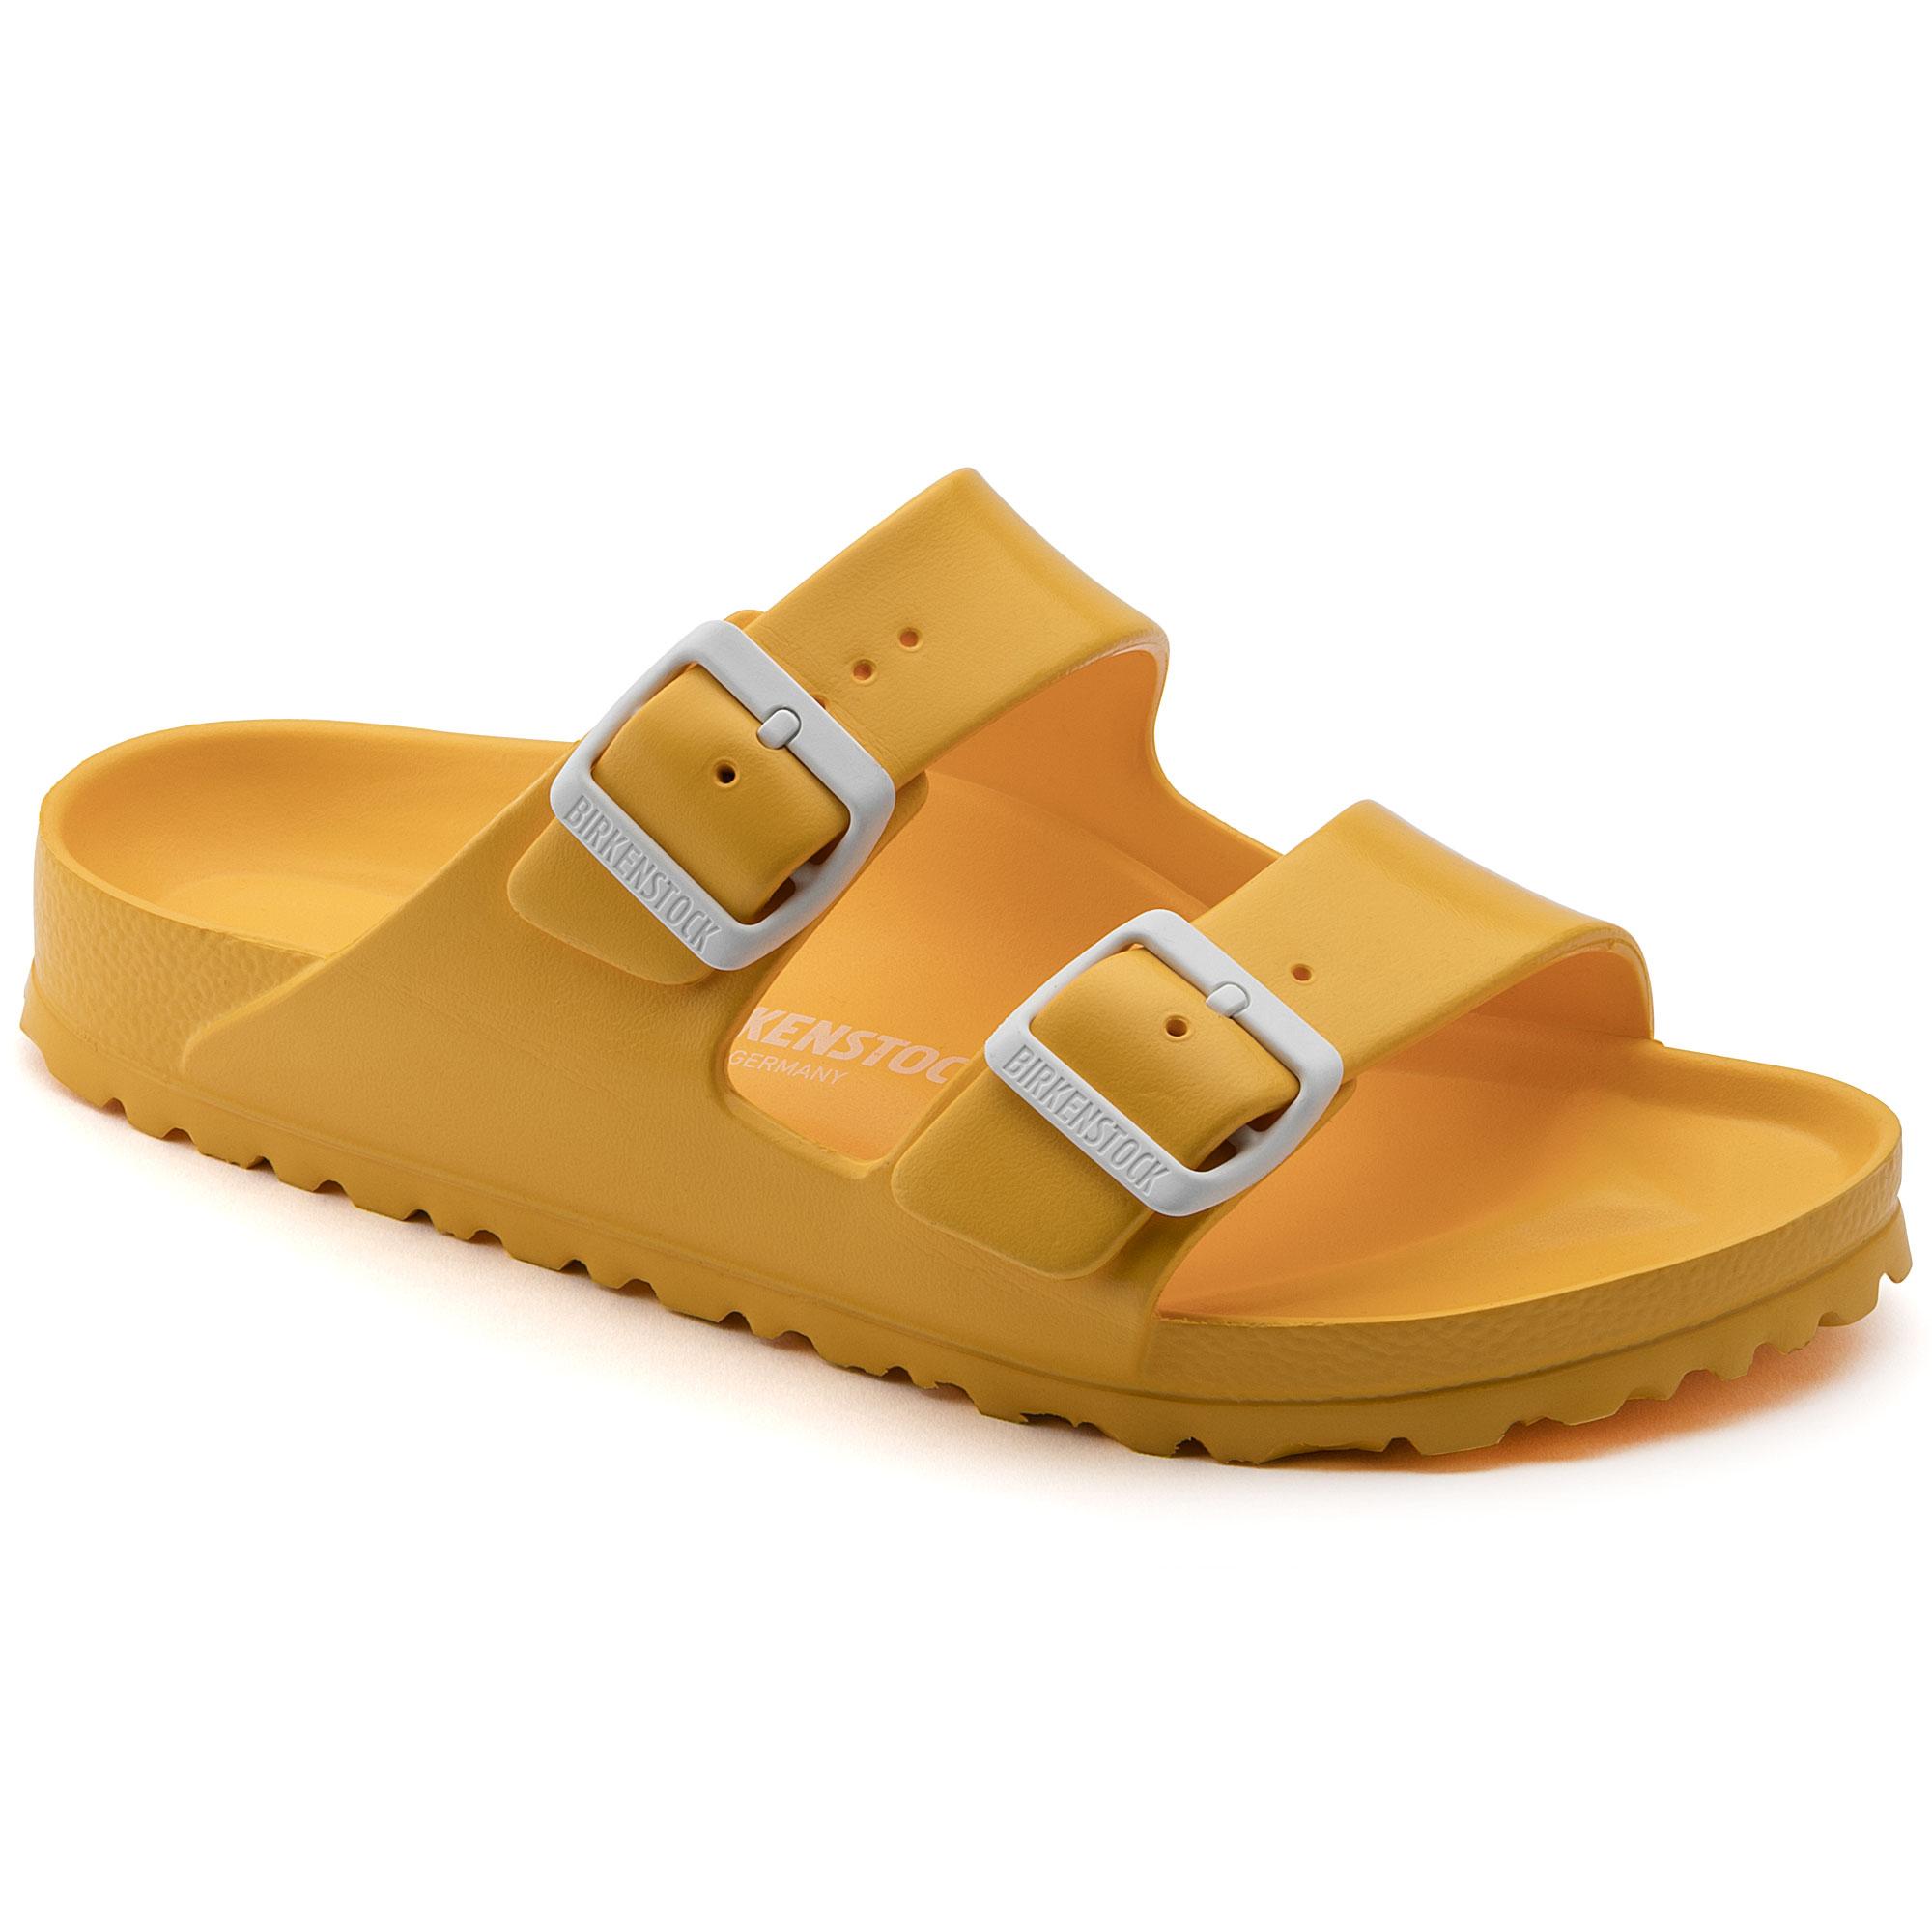 Birkenstock Gizeh Essentials EVA Scuba Yellow